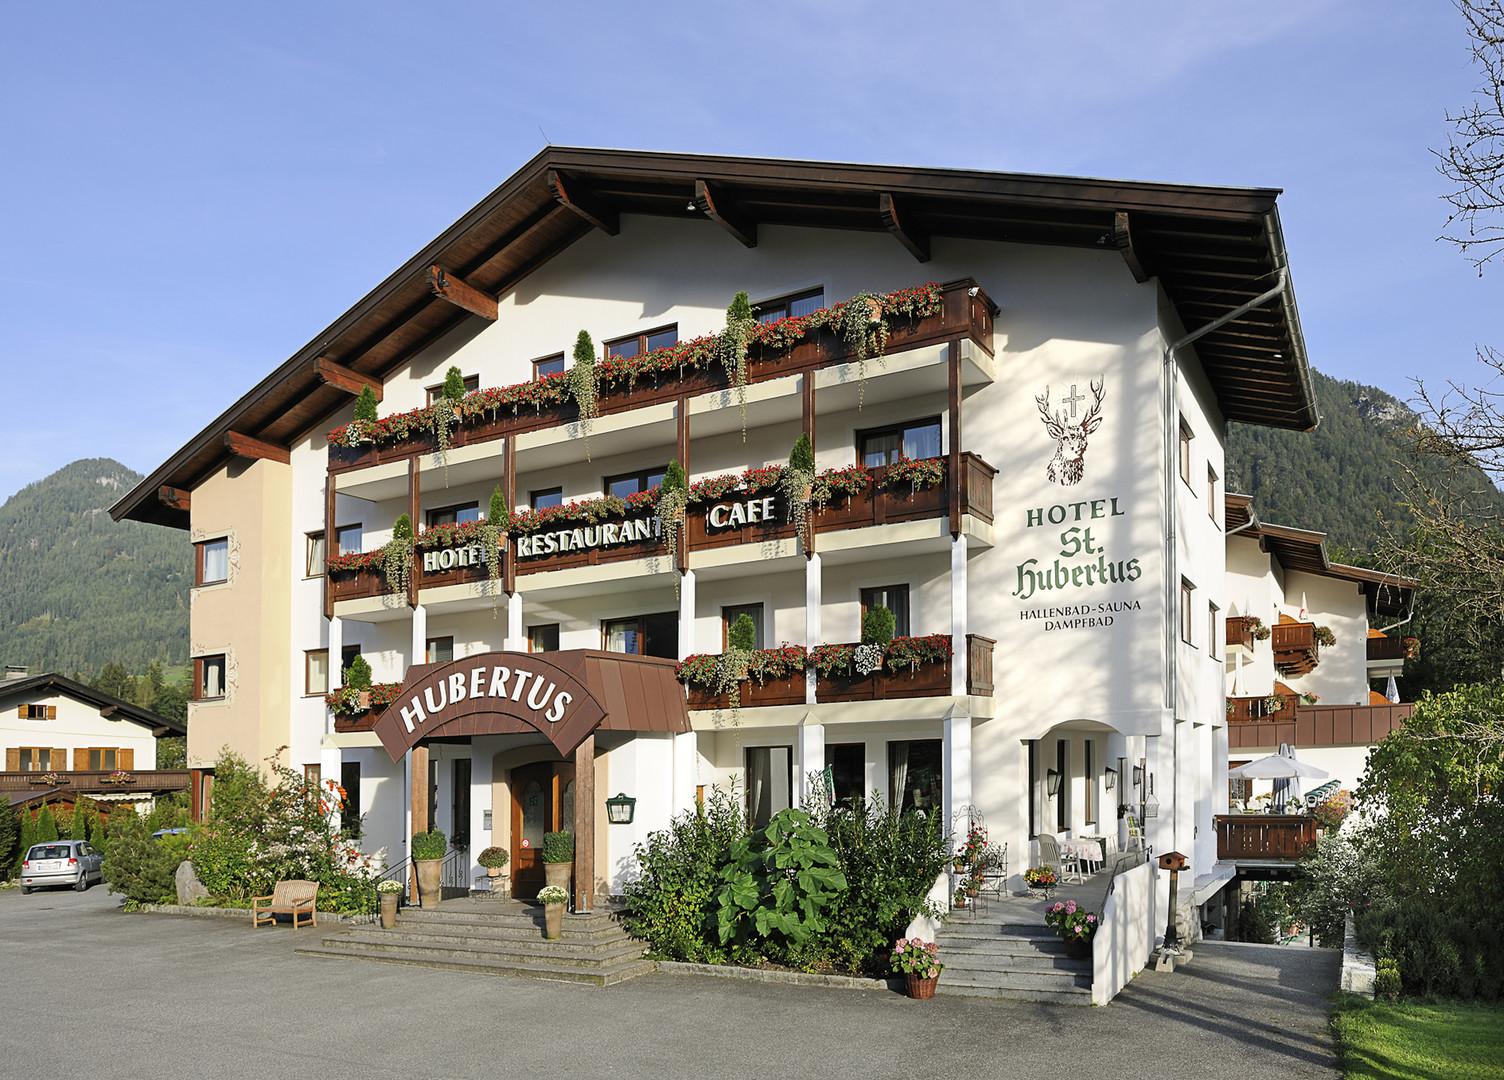 Hotel St. Hubertus Lofer